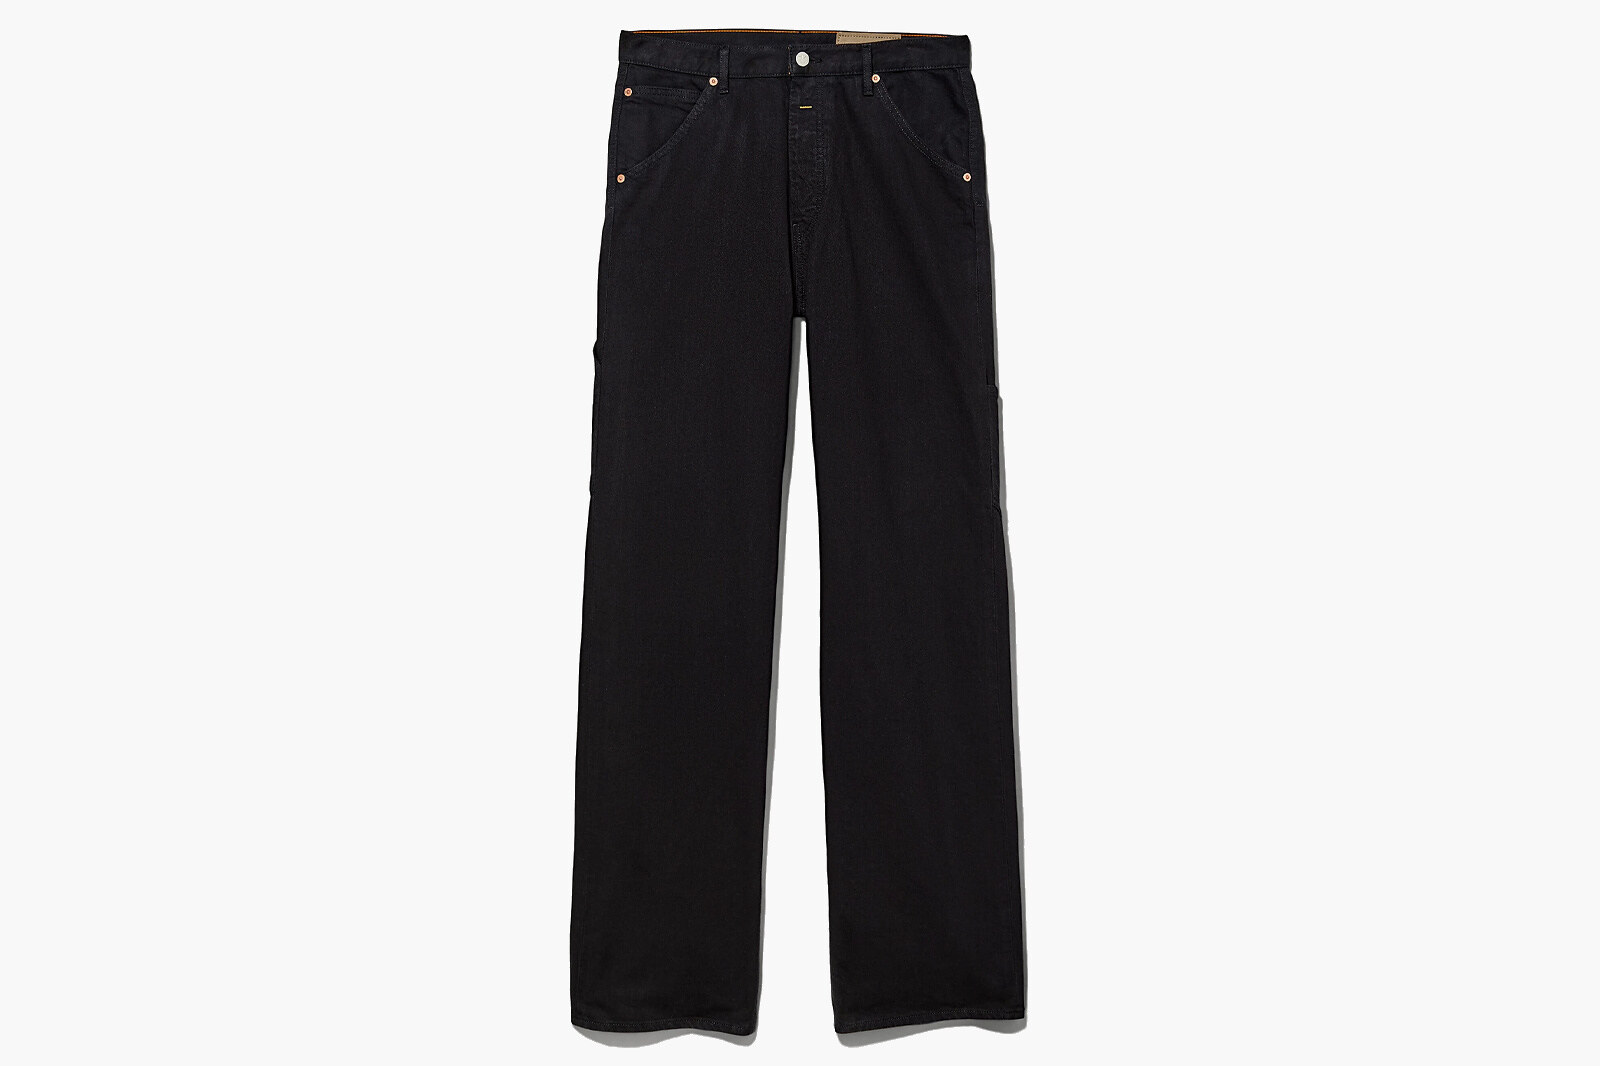 Heron Preston x Calvin Klein jeans in stile tuta da lavoro